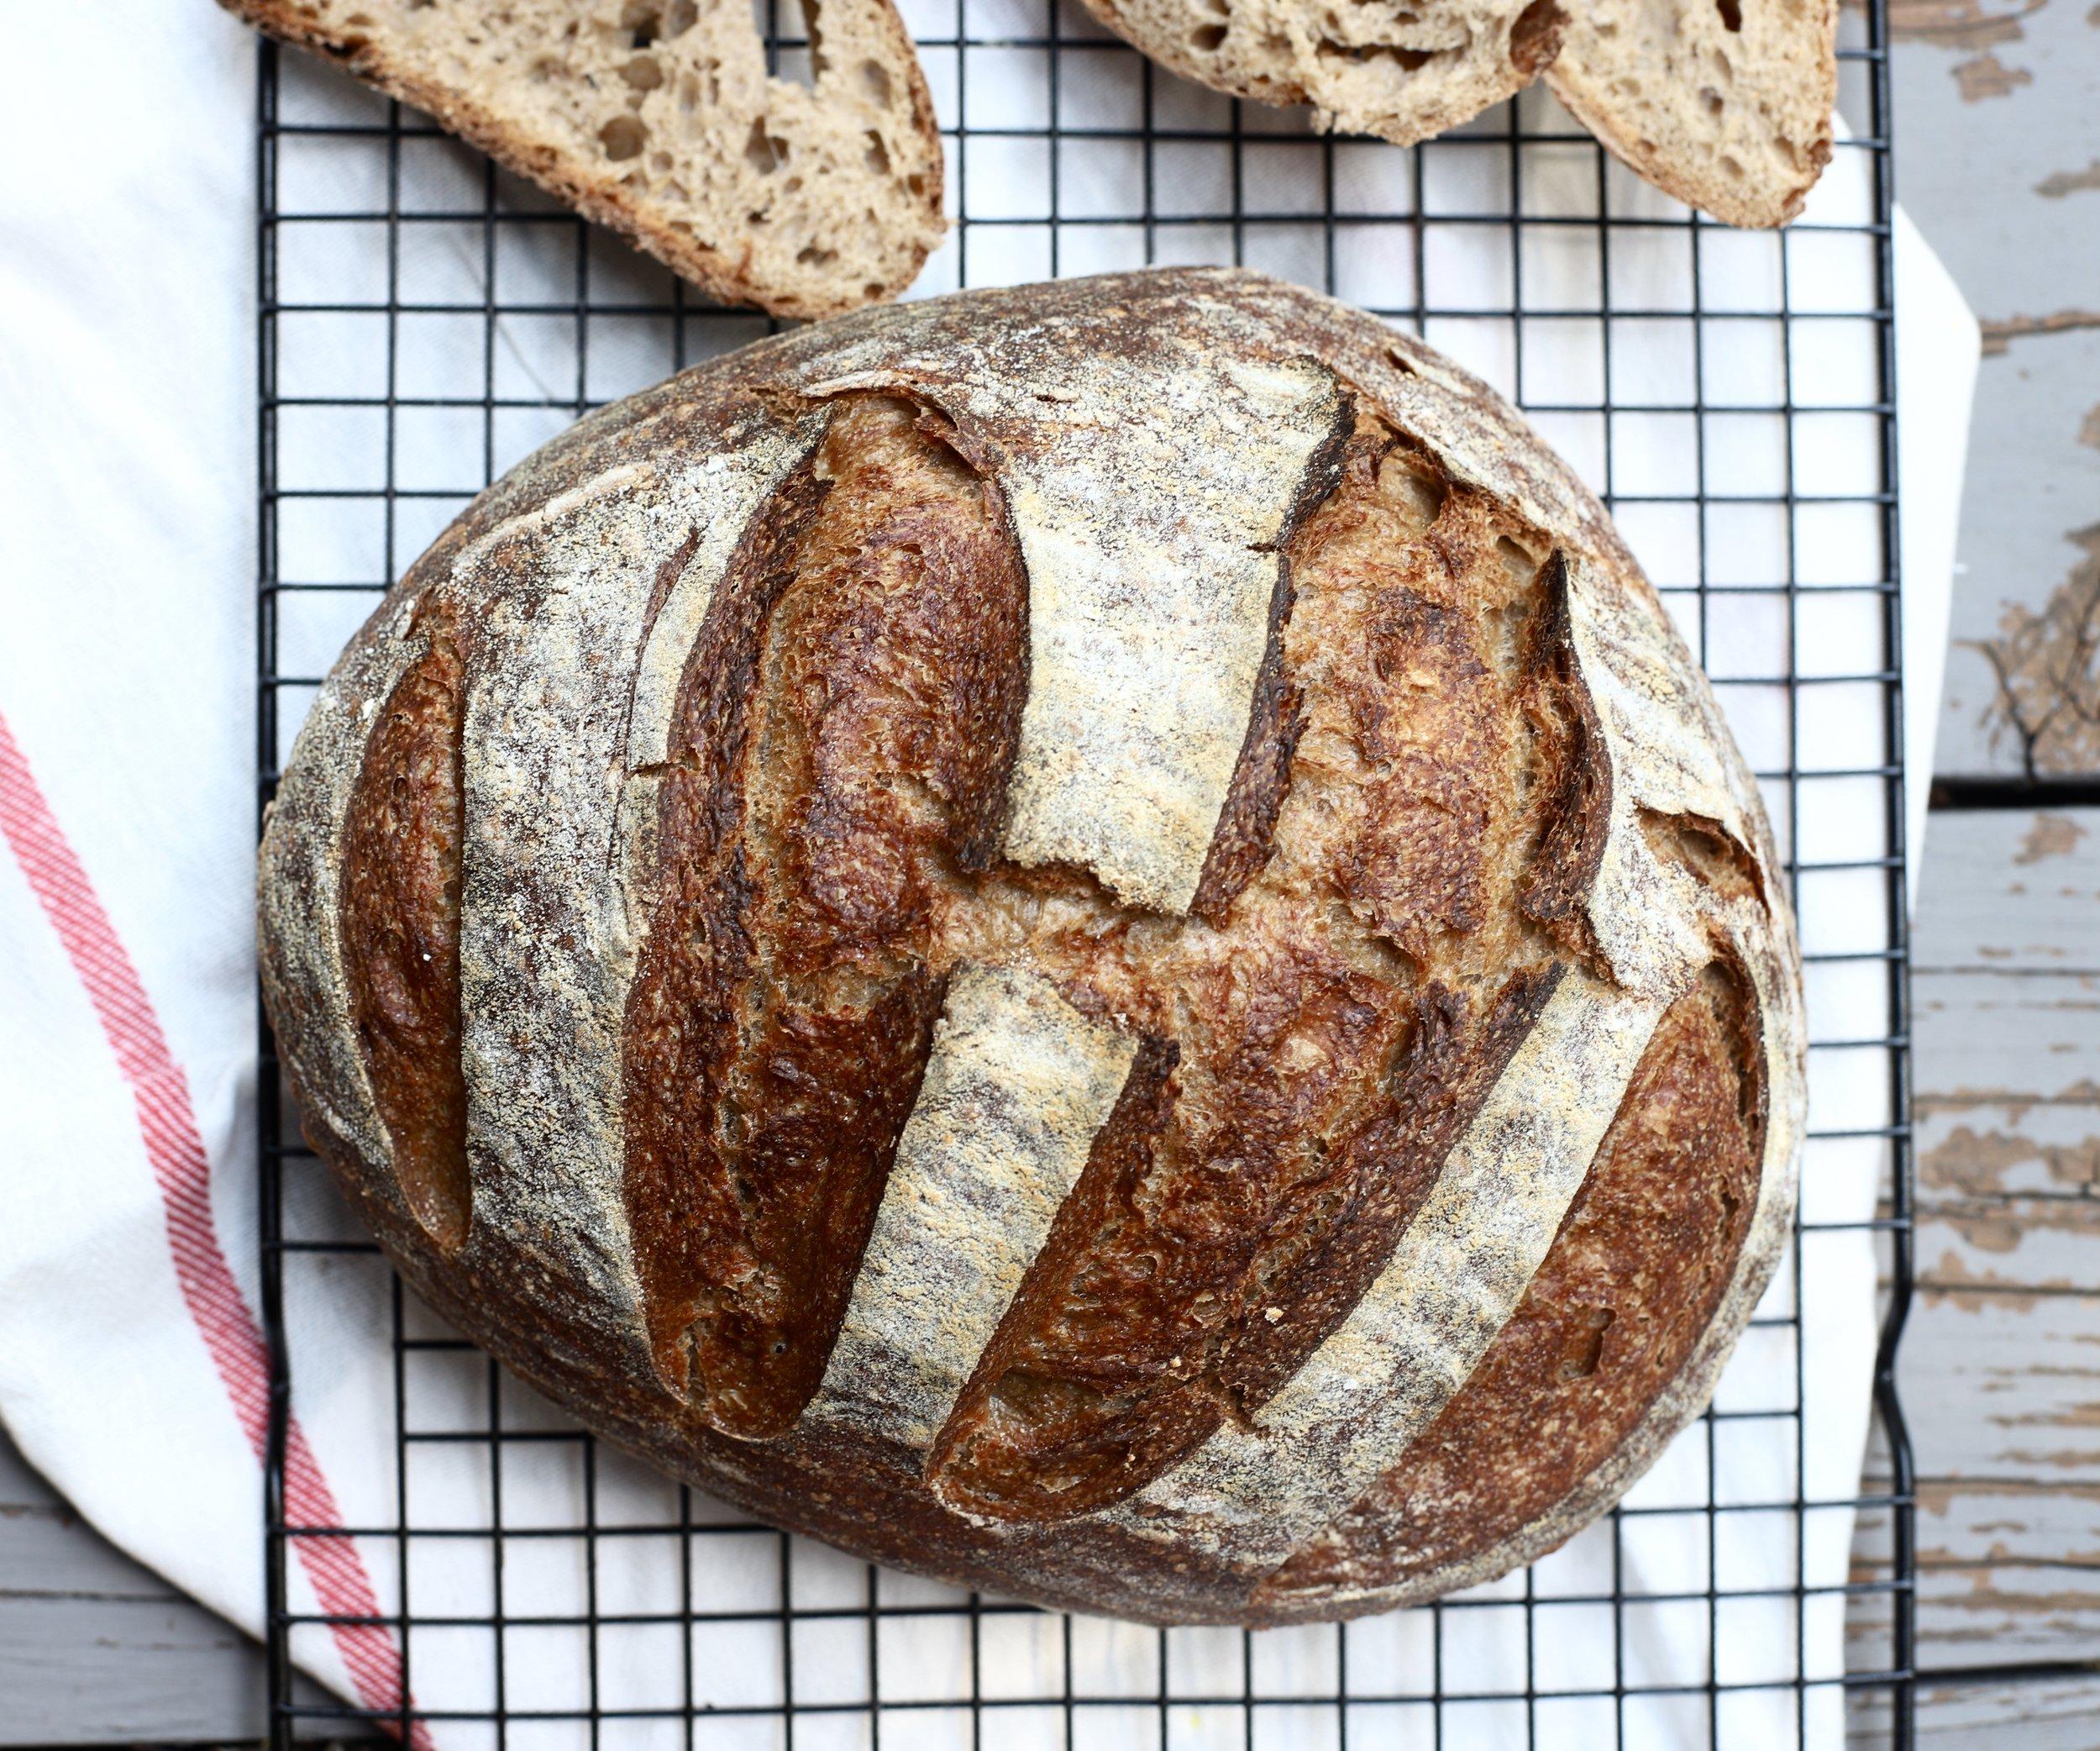 Beginner's Guide to Sourdough Bread